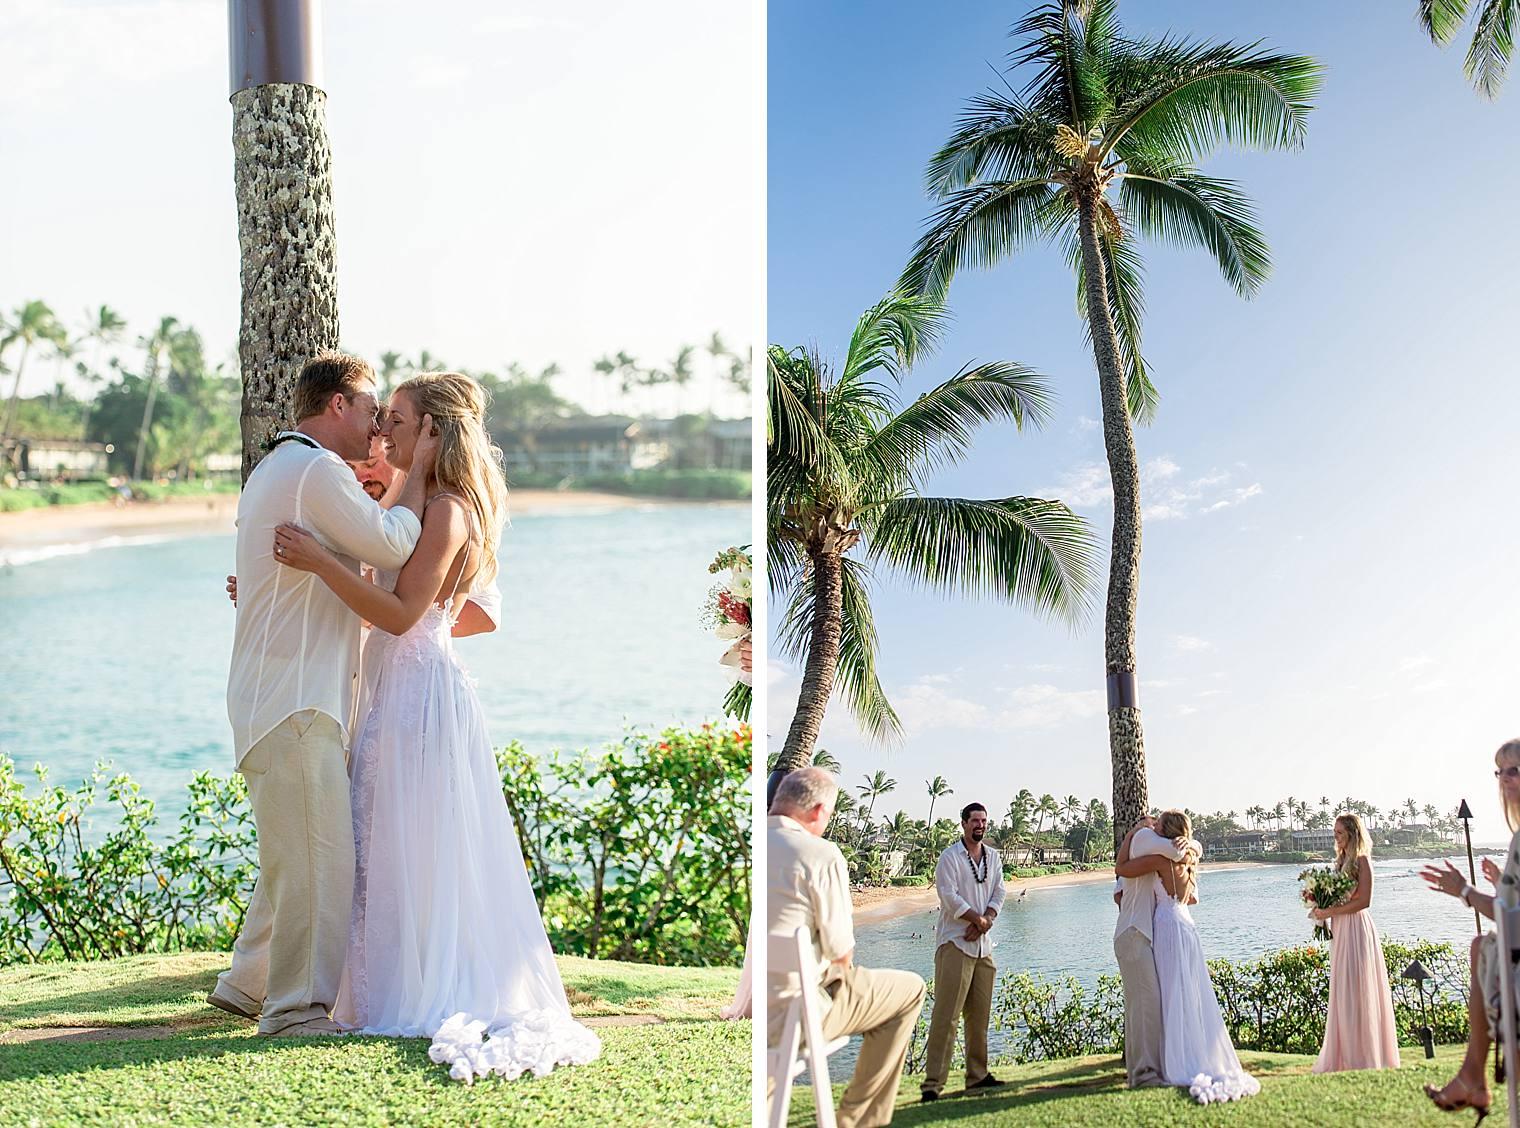 Destination Wedding at Sea House Napili - Maui Wedding Photographer_0023